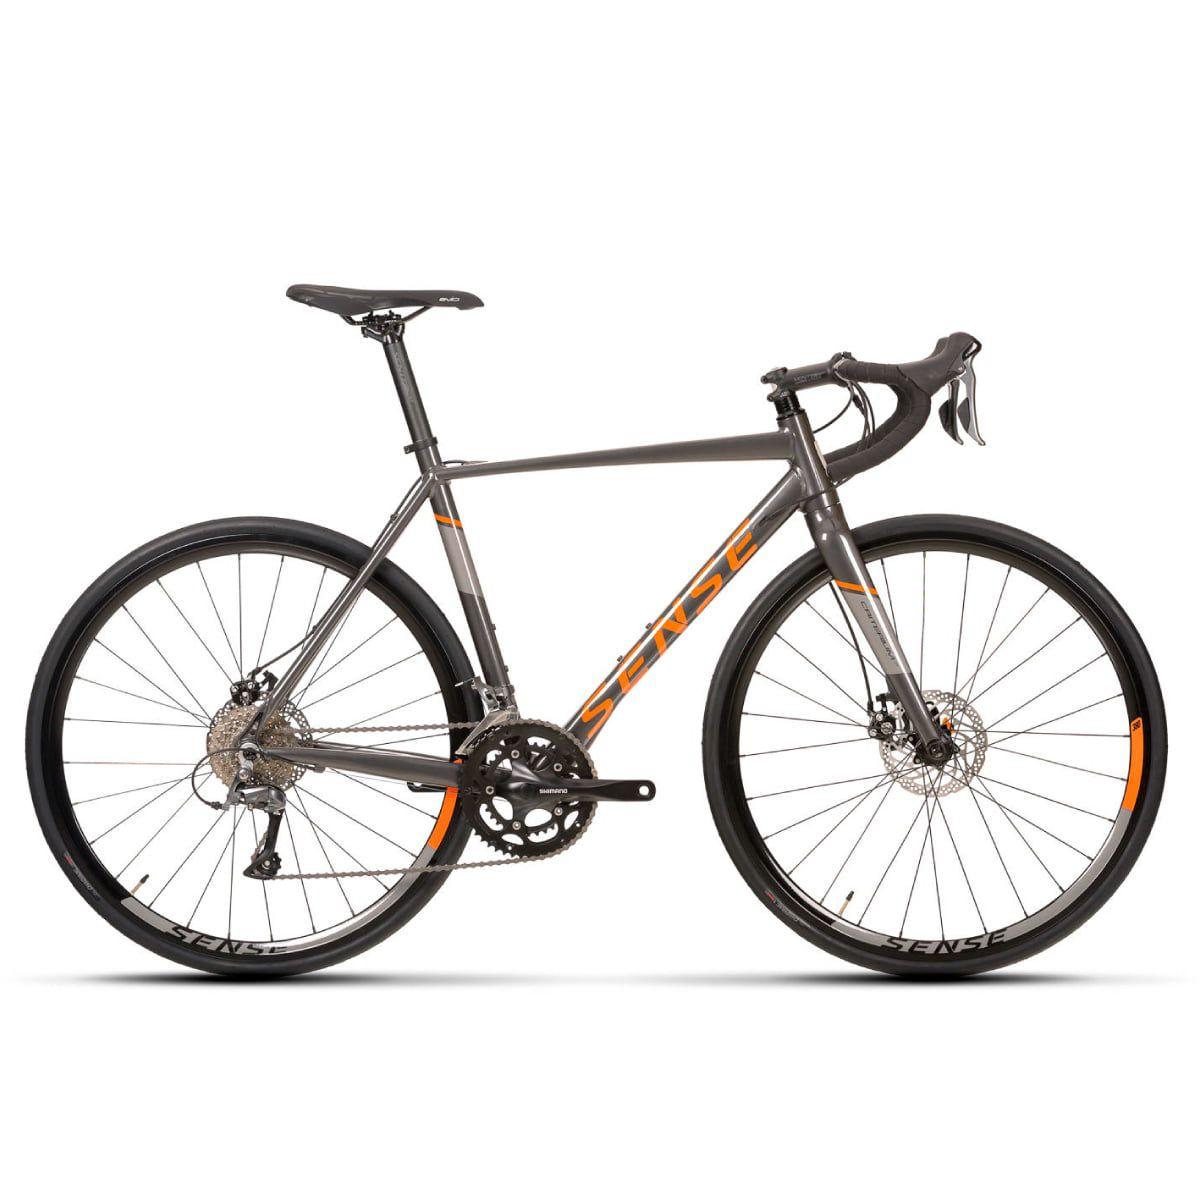 Bike Sense Criterium Comp 2020 Shimano Claris 2x8v Aro 700 Freio Disco